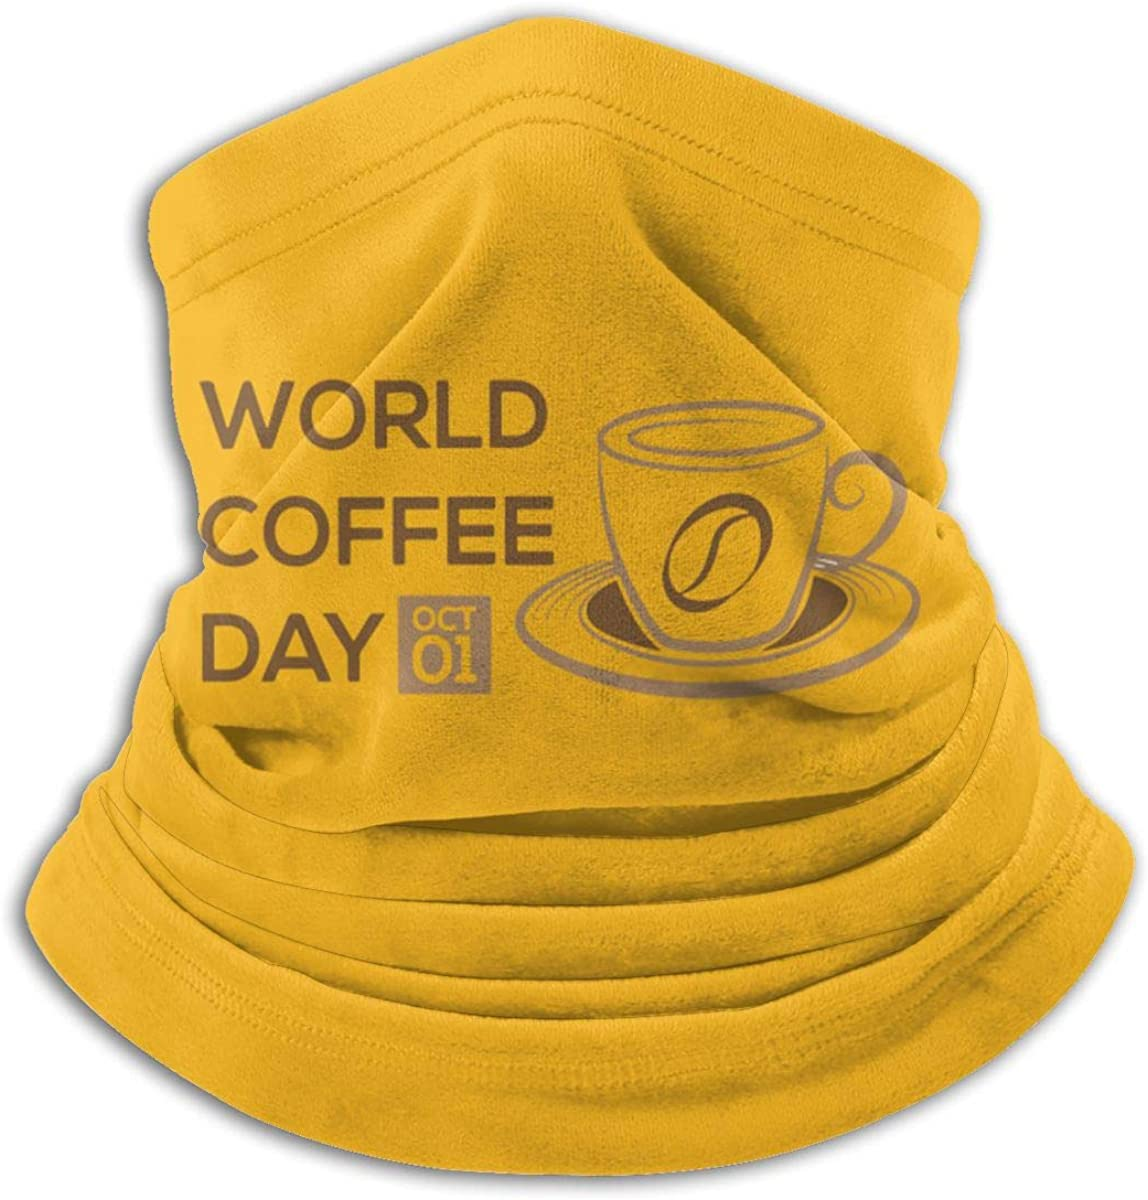 International Coffee Day Black Multi-function Neck Warmer Gaiter Polyester Neck Warmer Windproof Winter Neck Gaiter Cold Weather Scarf For Men Women